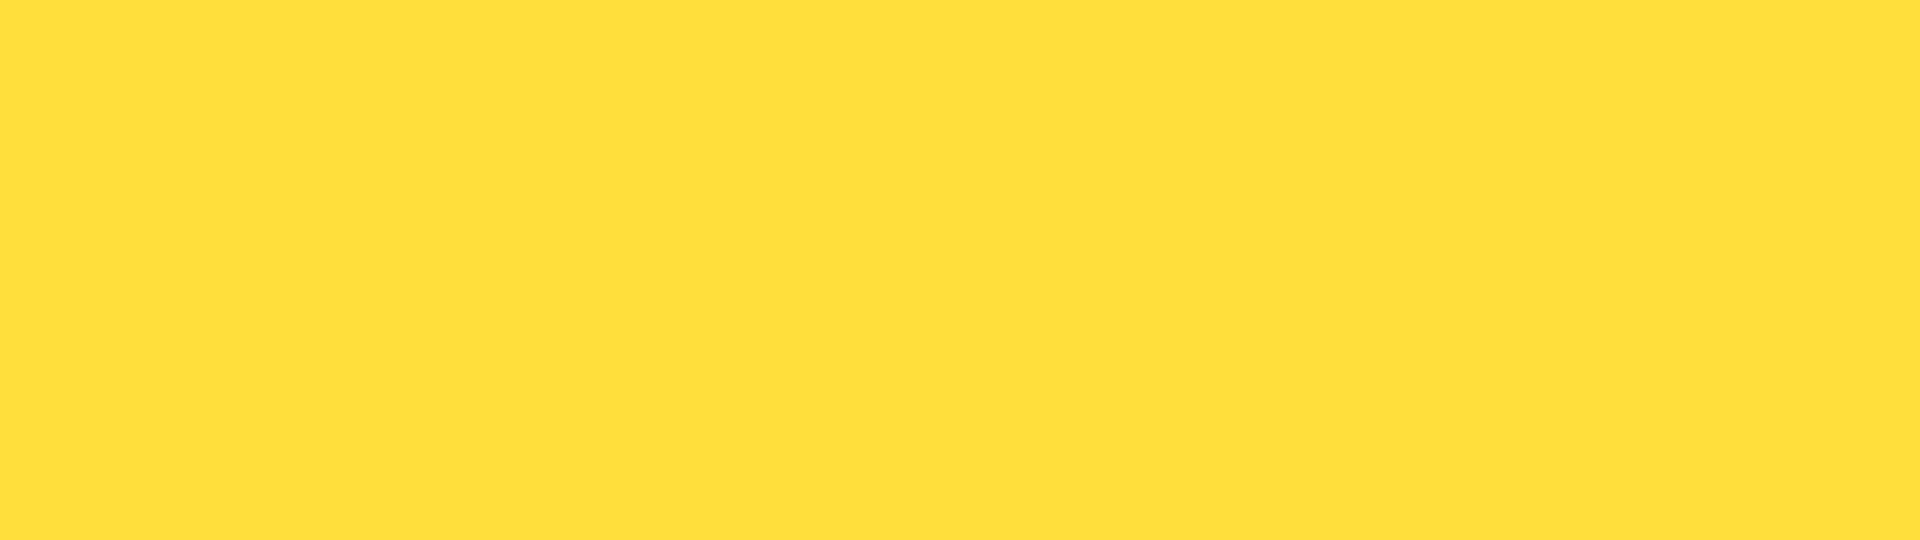 CATEGORY-TEL-SPIGENAKSESUARLARDASEPETTE45INDIRIM-20-01